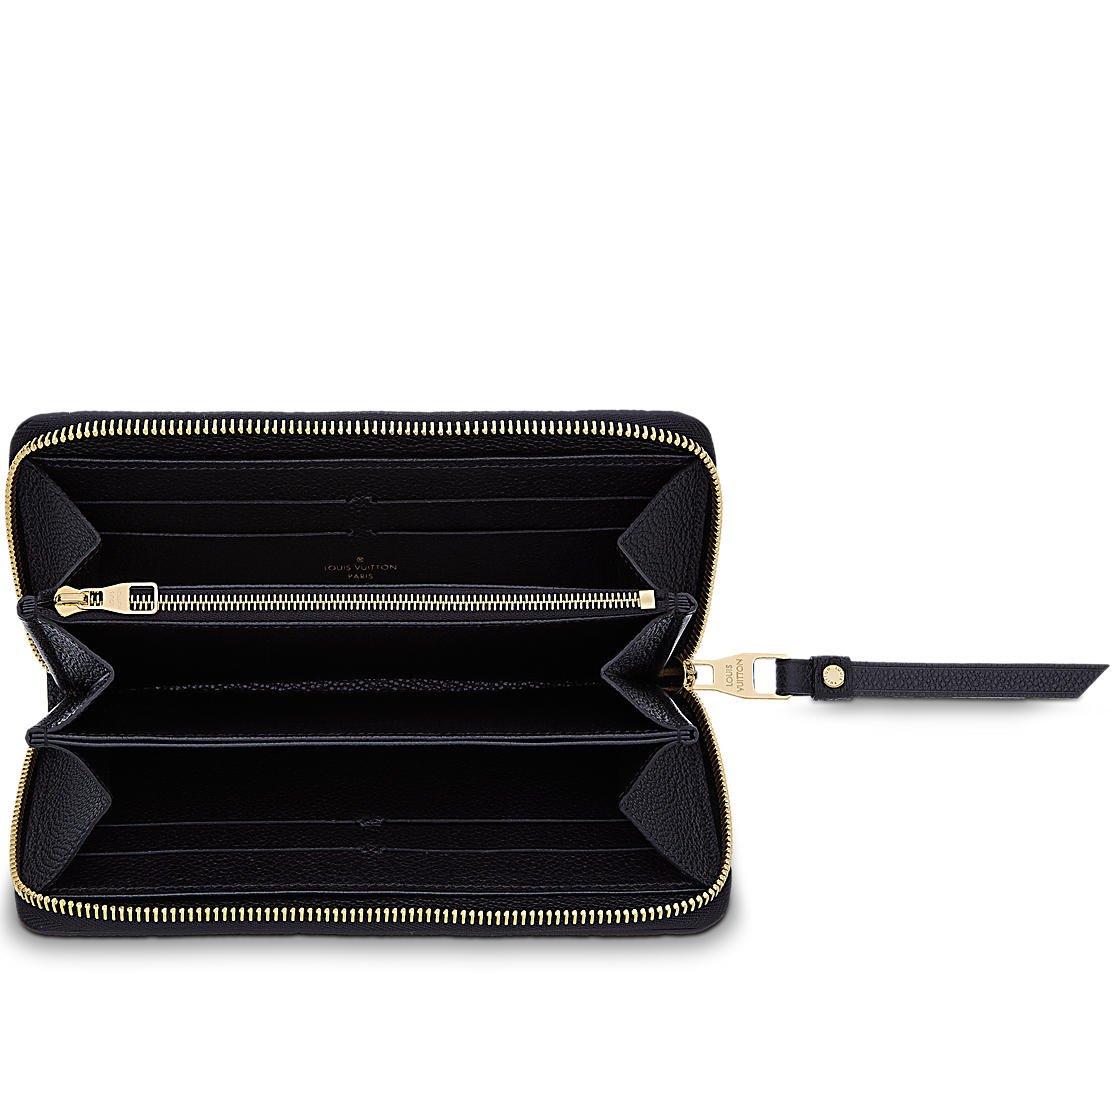 low priced d5b80 001fa Louis Vuitton Monogram Empreinte Zippy Wallet M61864 Noir